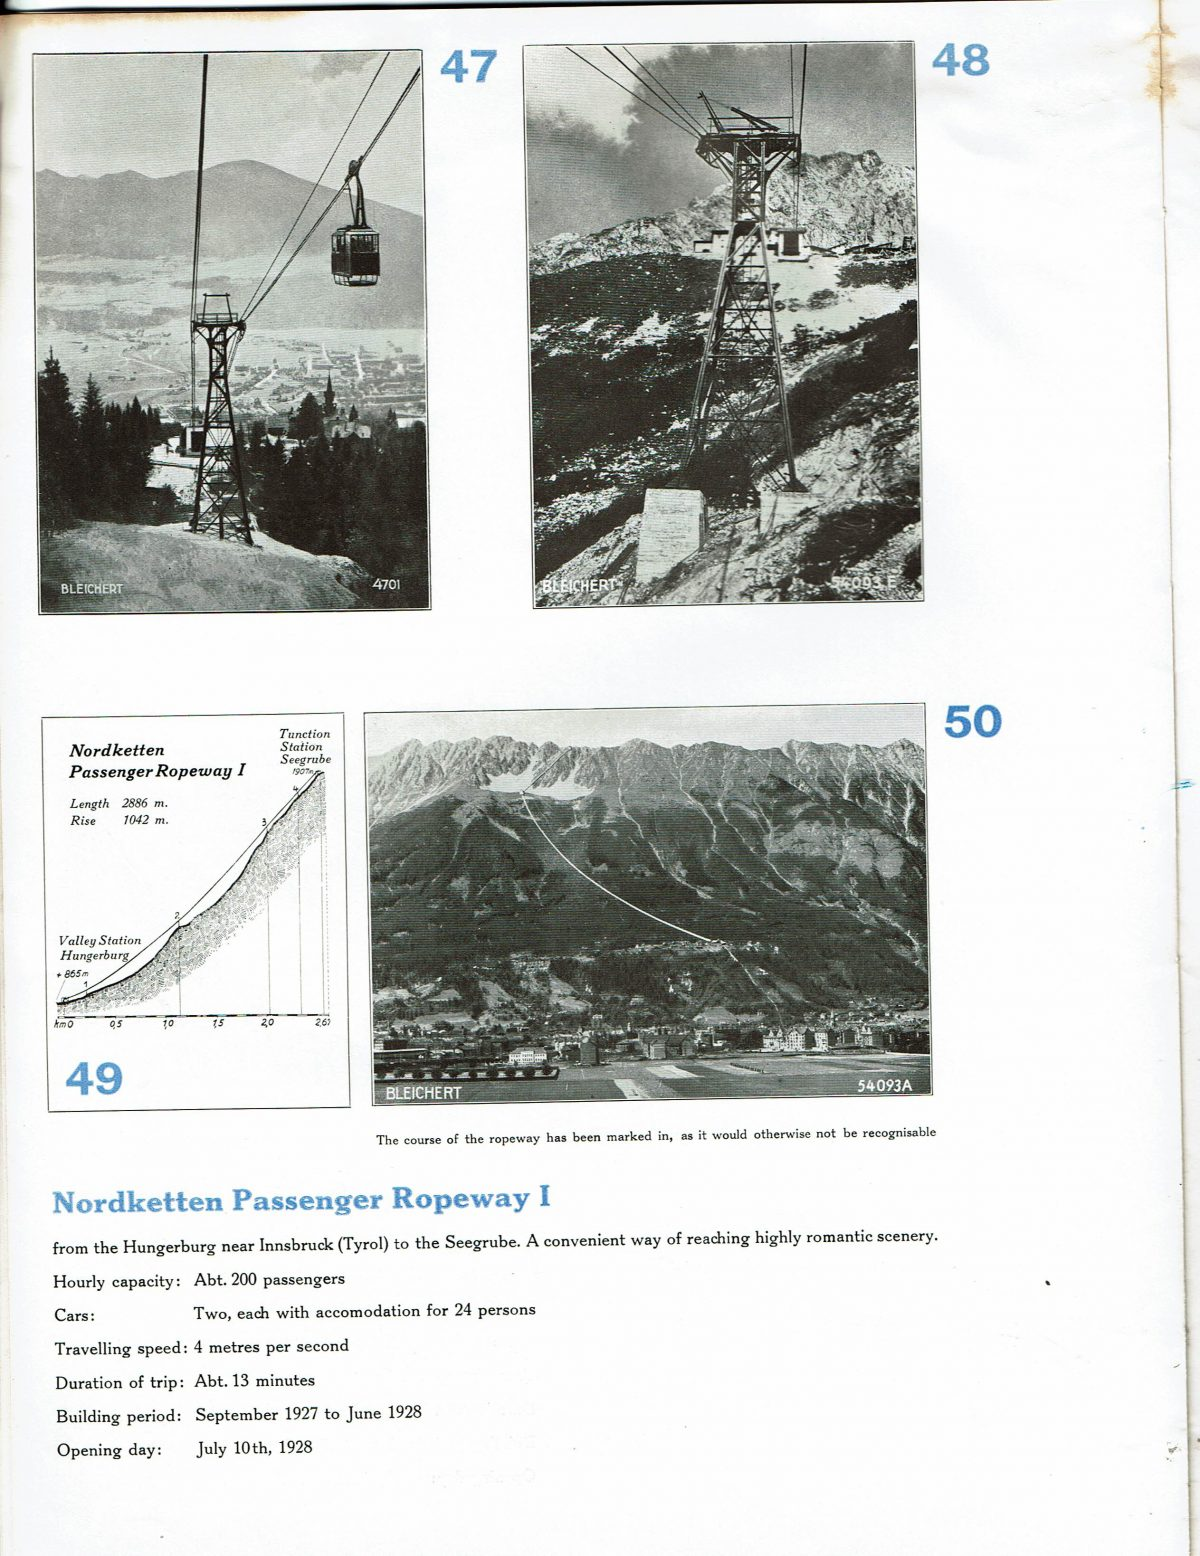 1933 Bleichert Passenger Arial Ropeways 21